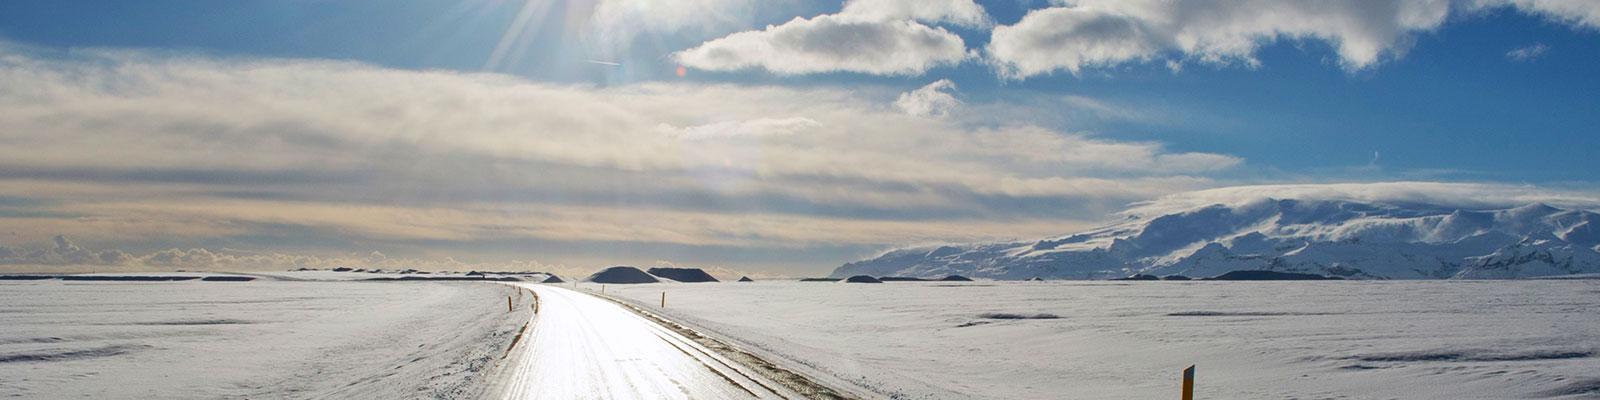 North Western Canada Road